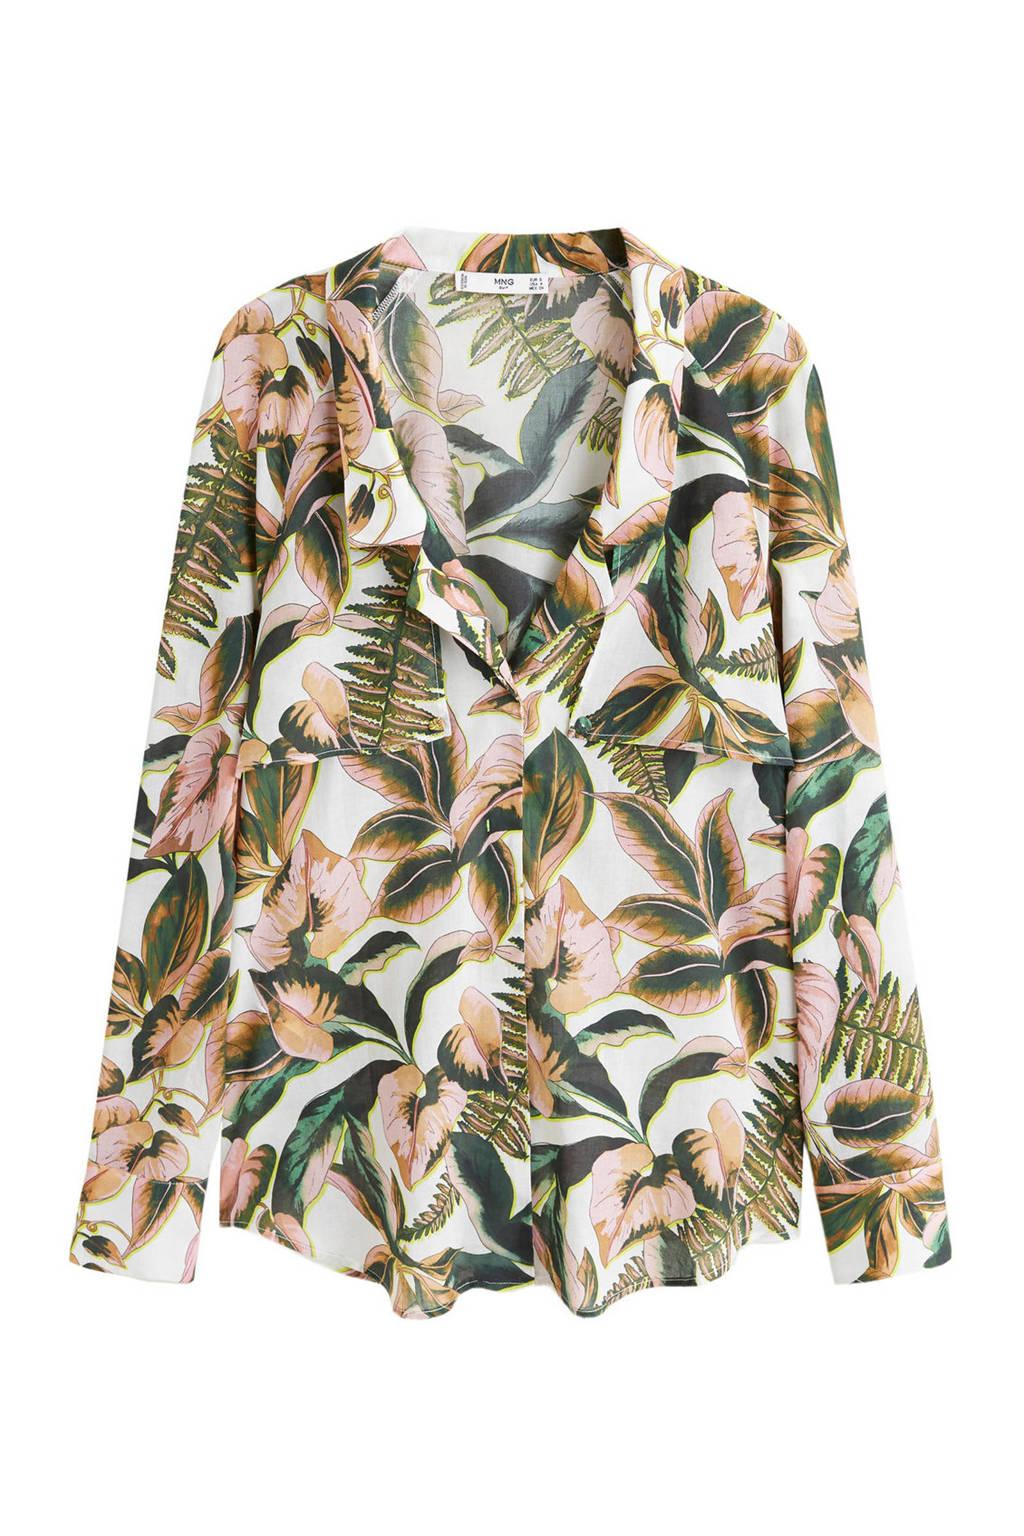 Mango gebloemde blouse, Ecru/groen/roze